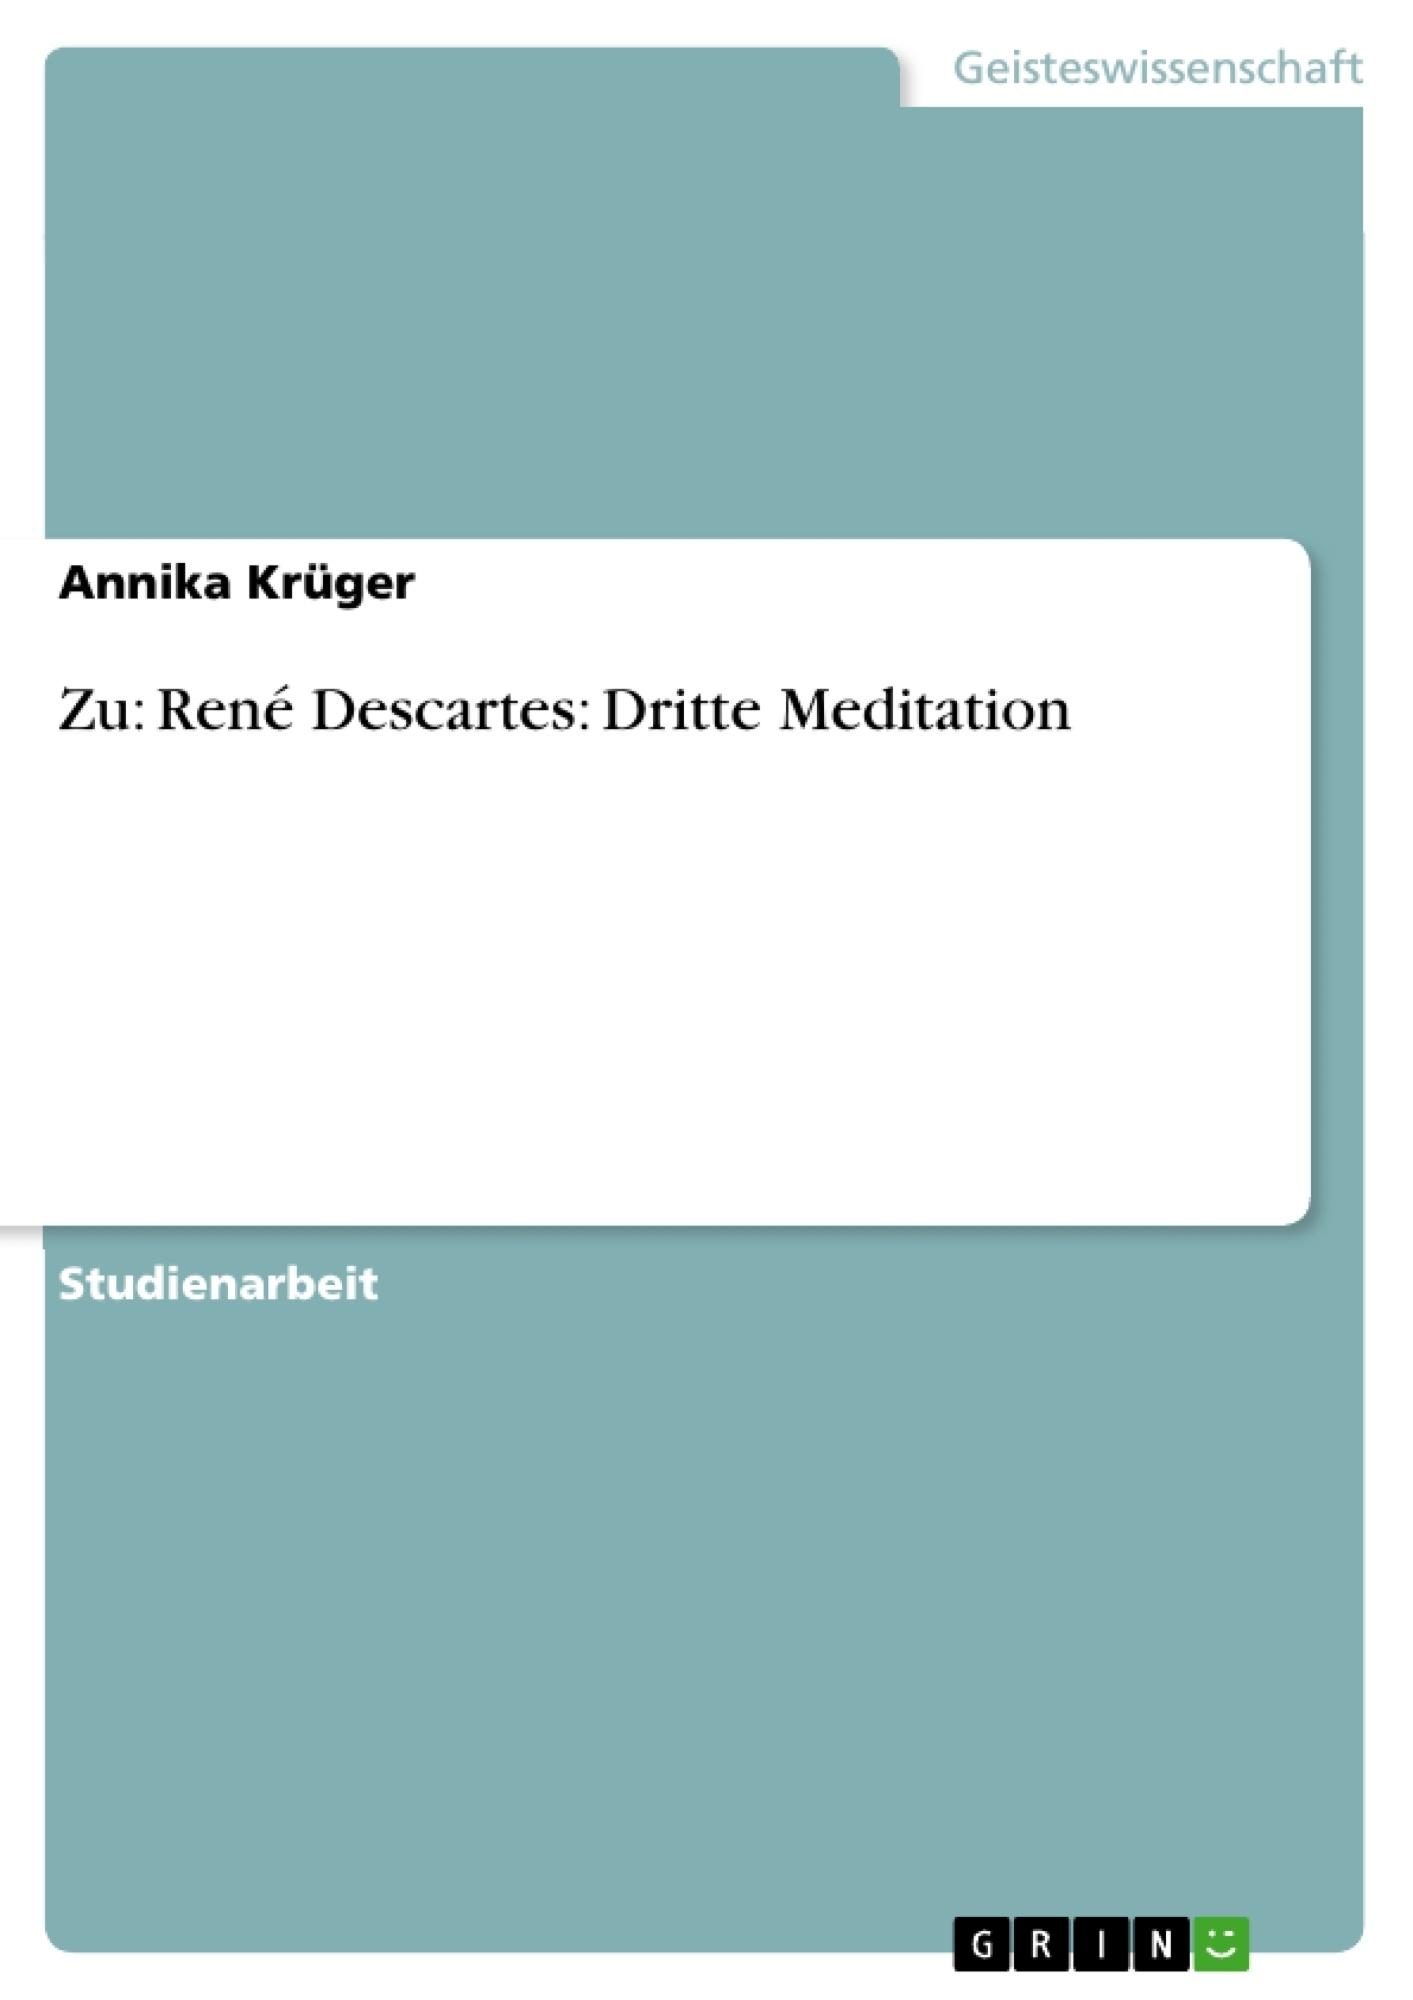 Titel: Zu: René Descartes: Dritte Meditation